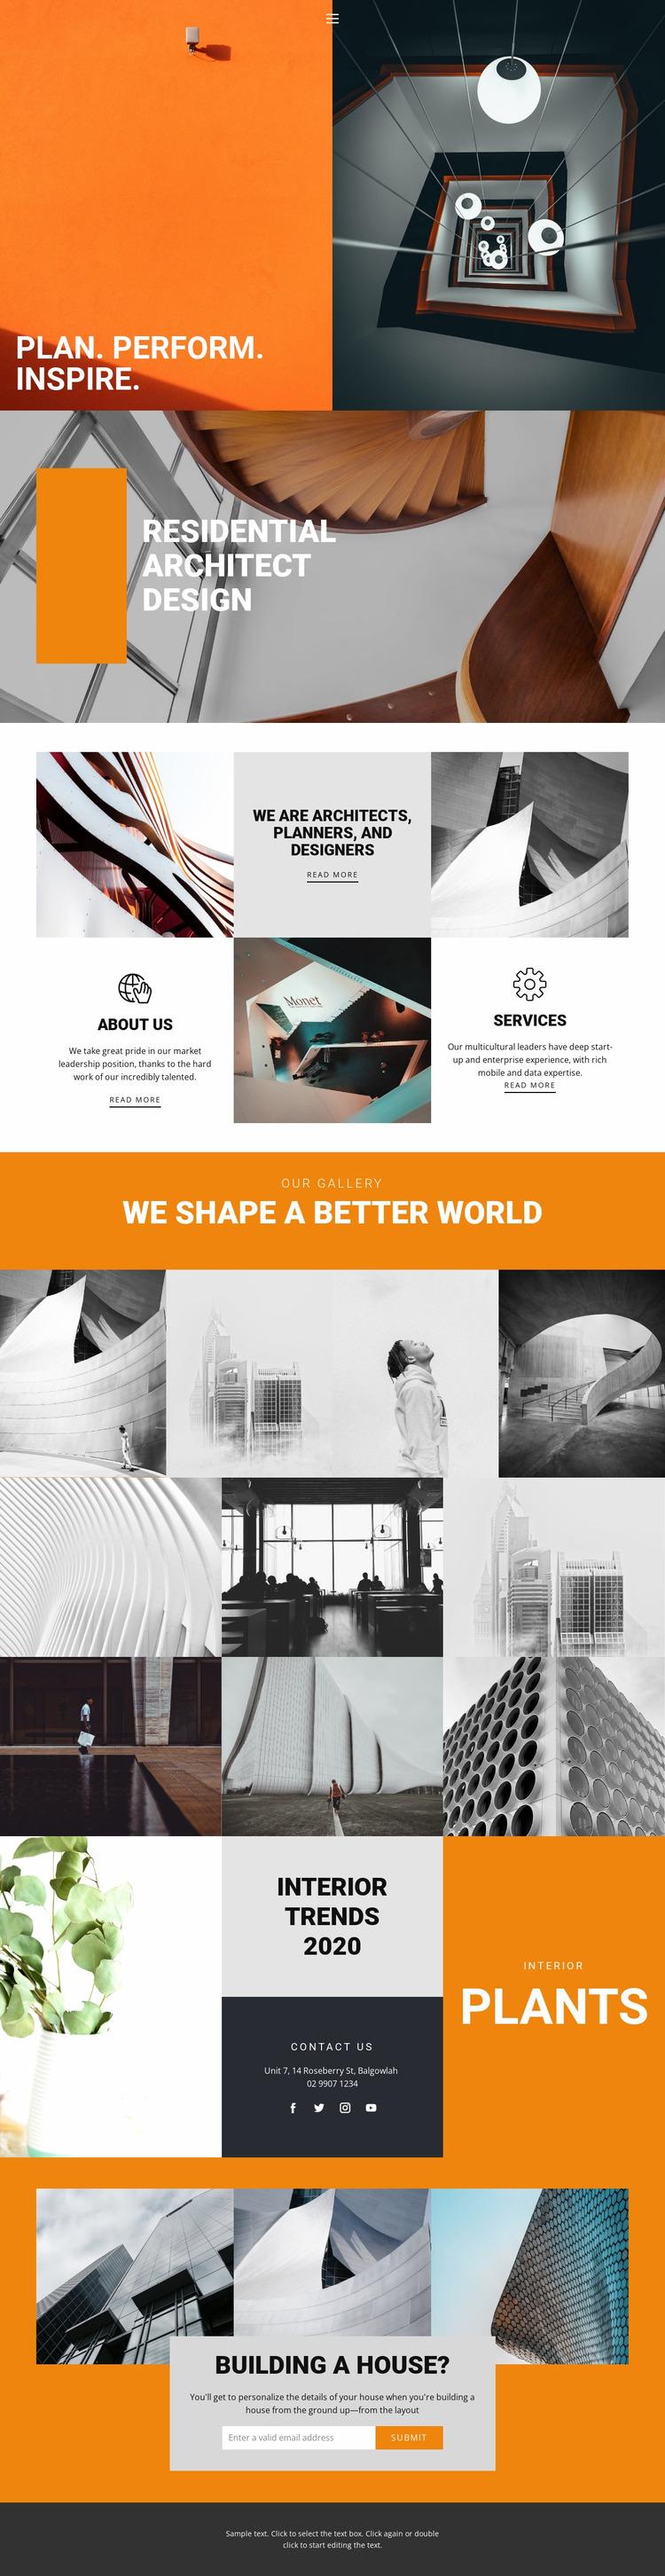 Inspiring ways of architecture Html Website Builder